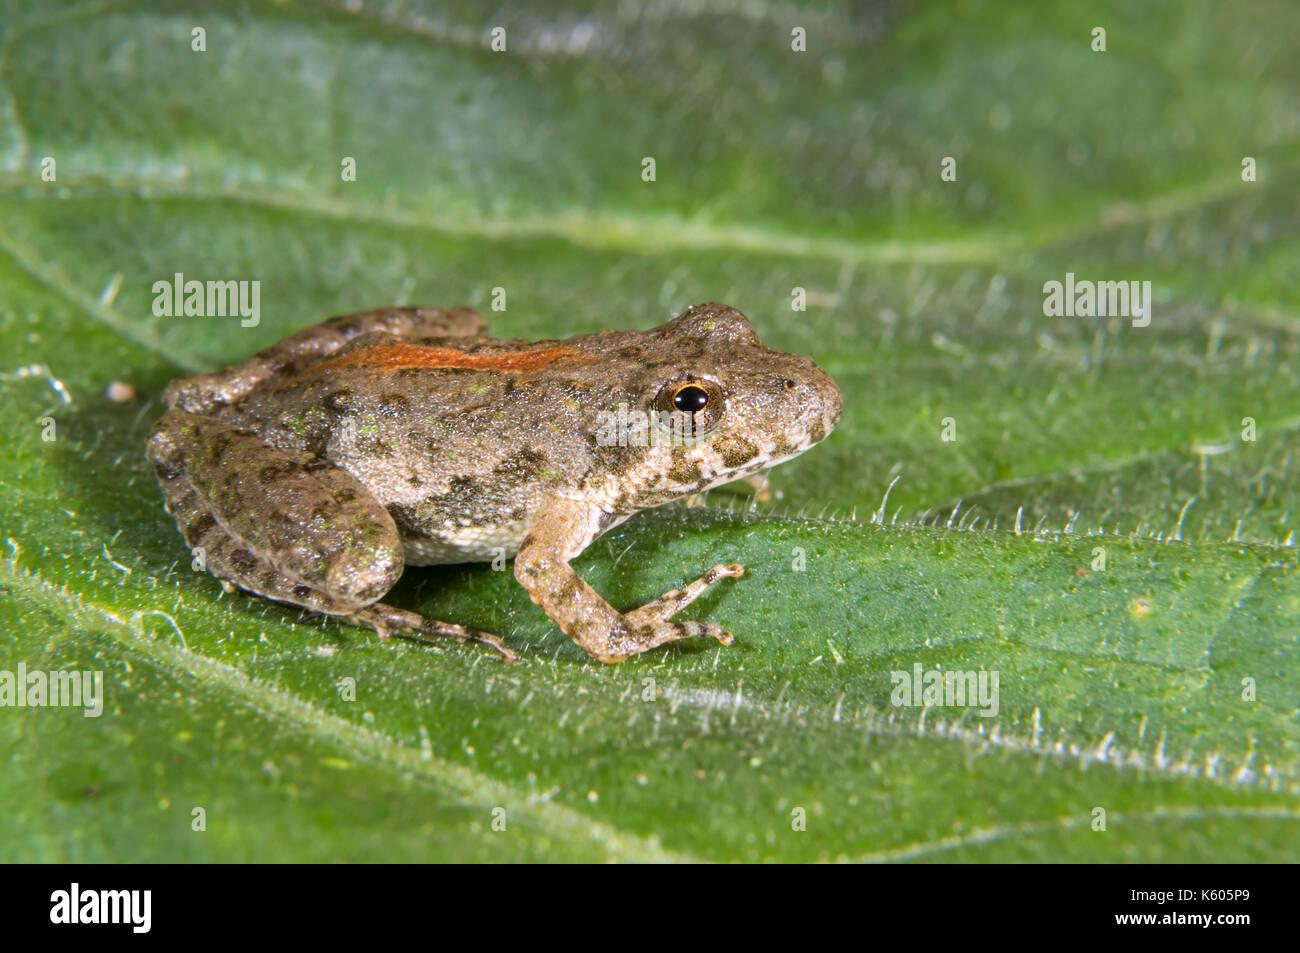 Blanchard's Northern Cricket Frog (Acris crepitans blanchardi) on a leaf, Ames, Iowa, USA Stock Photo